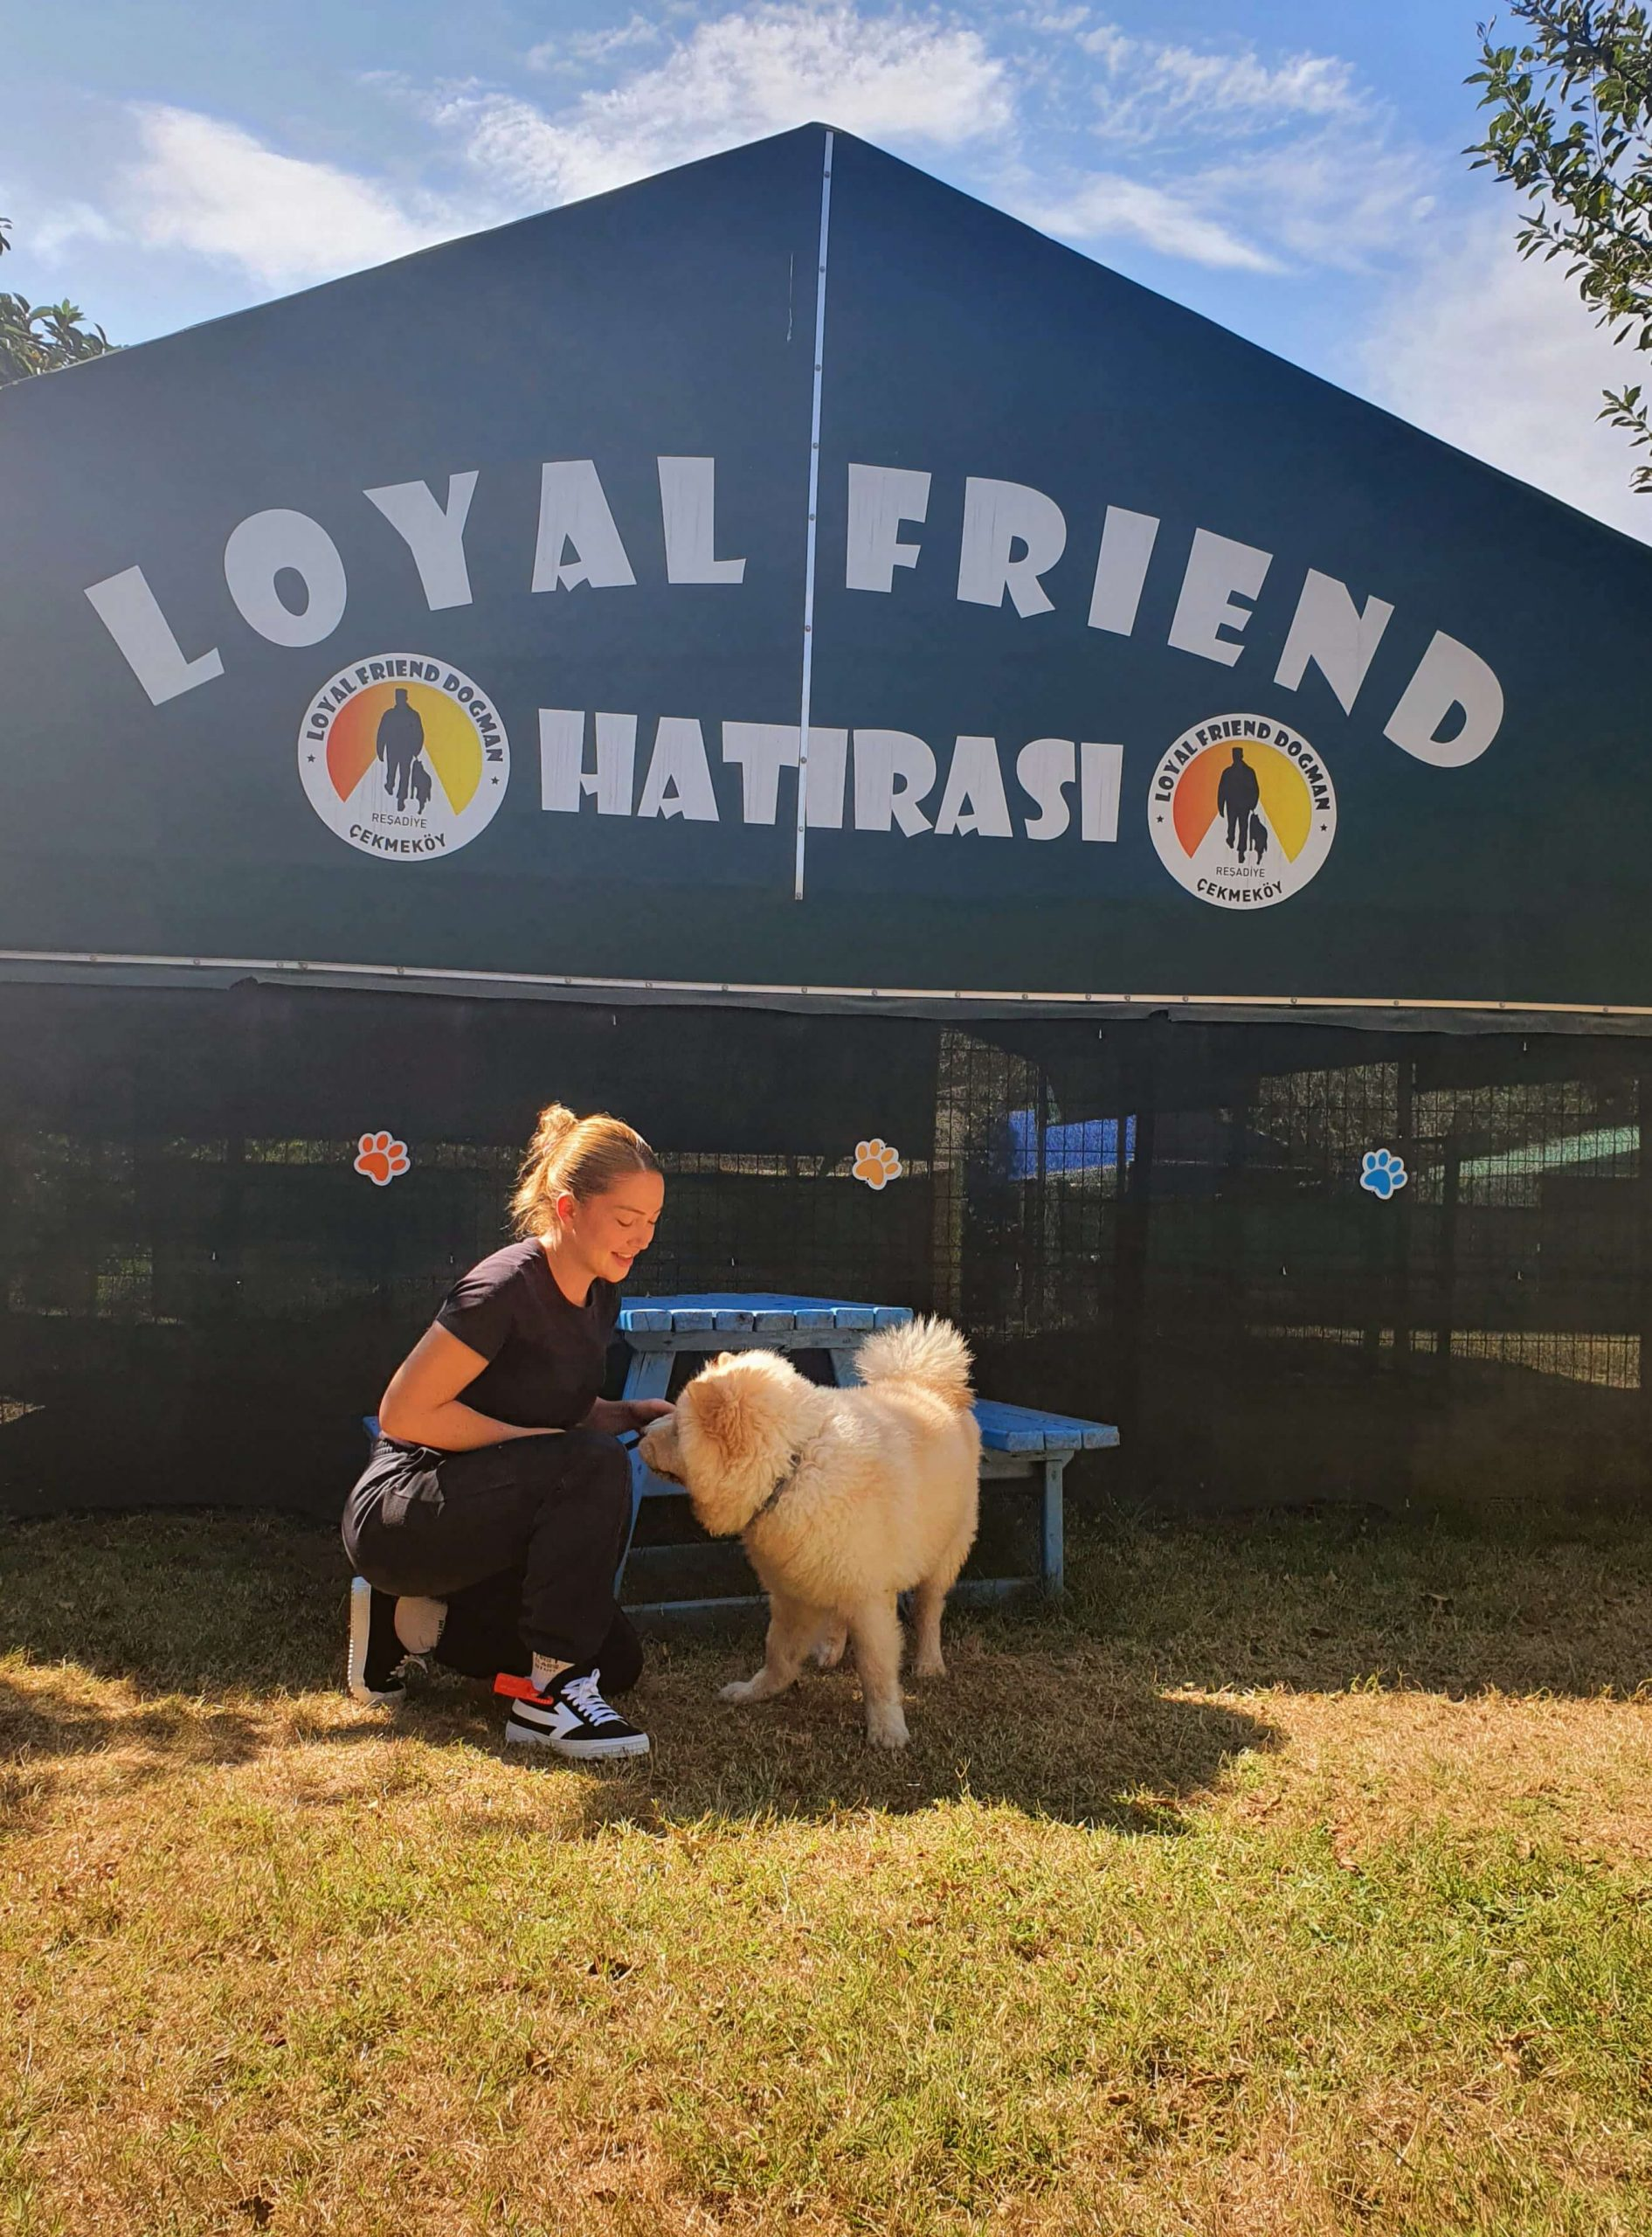 Danla Bilic de köpeğini Loyal Friend'e emanet etti.